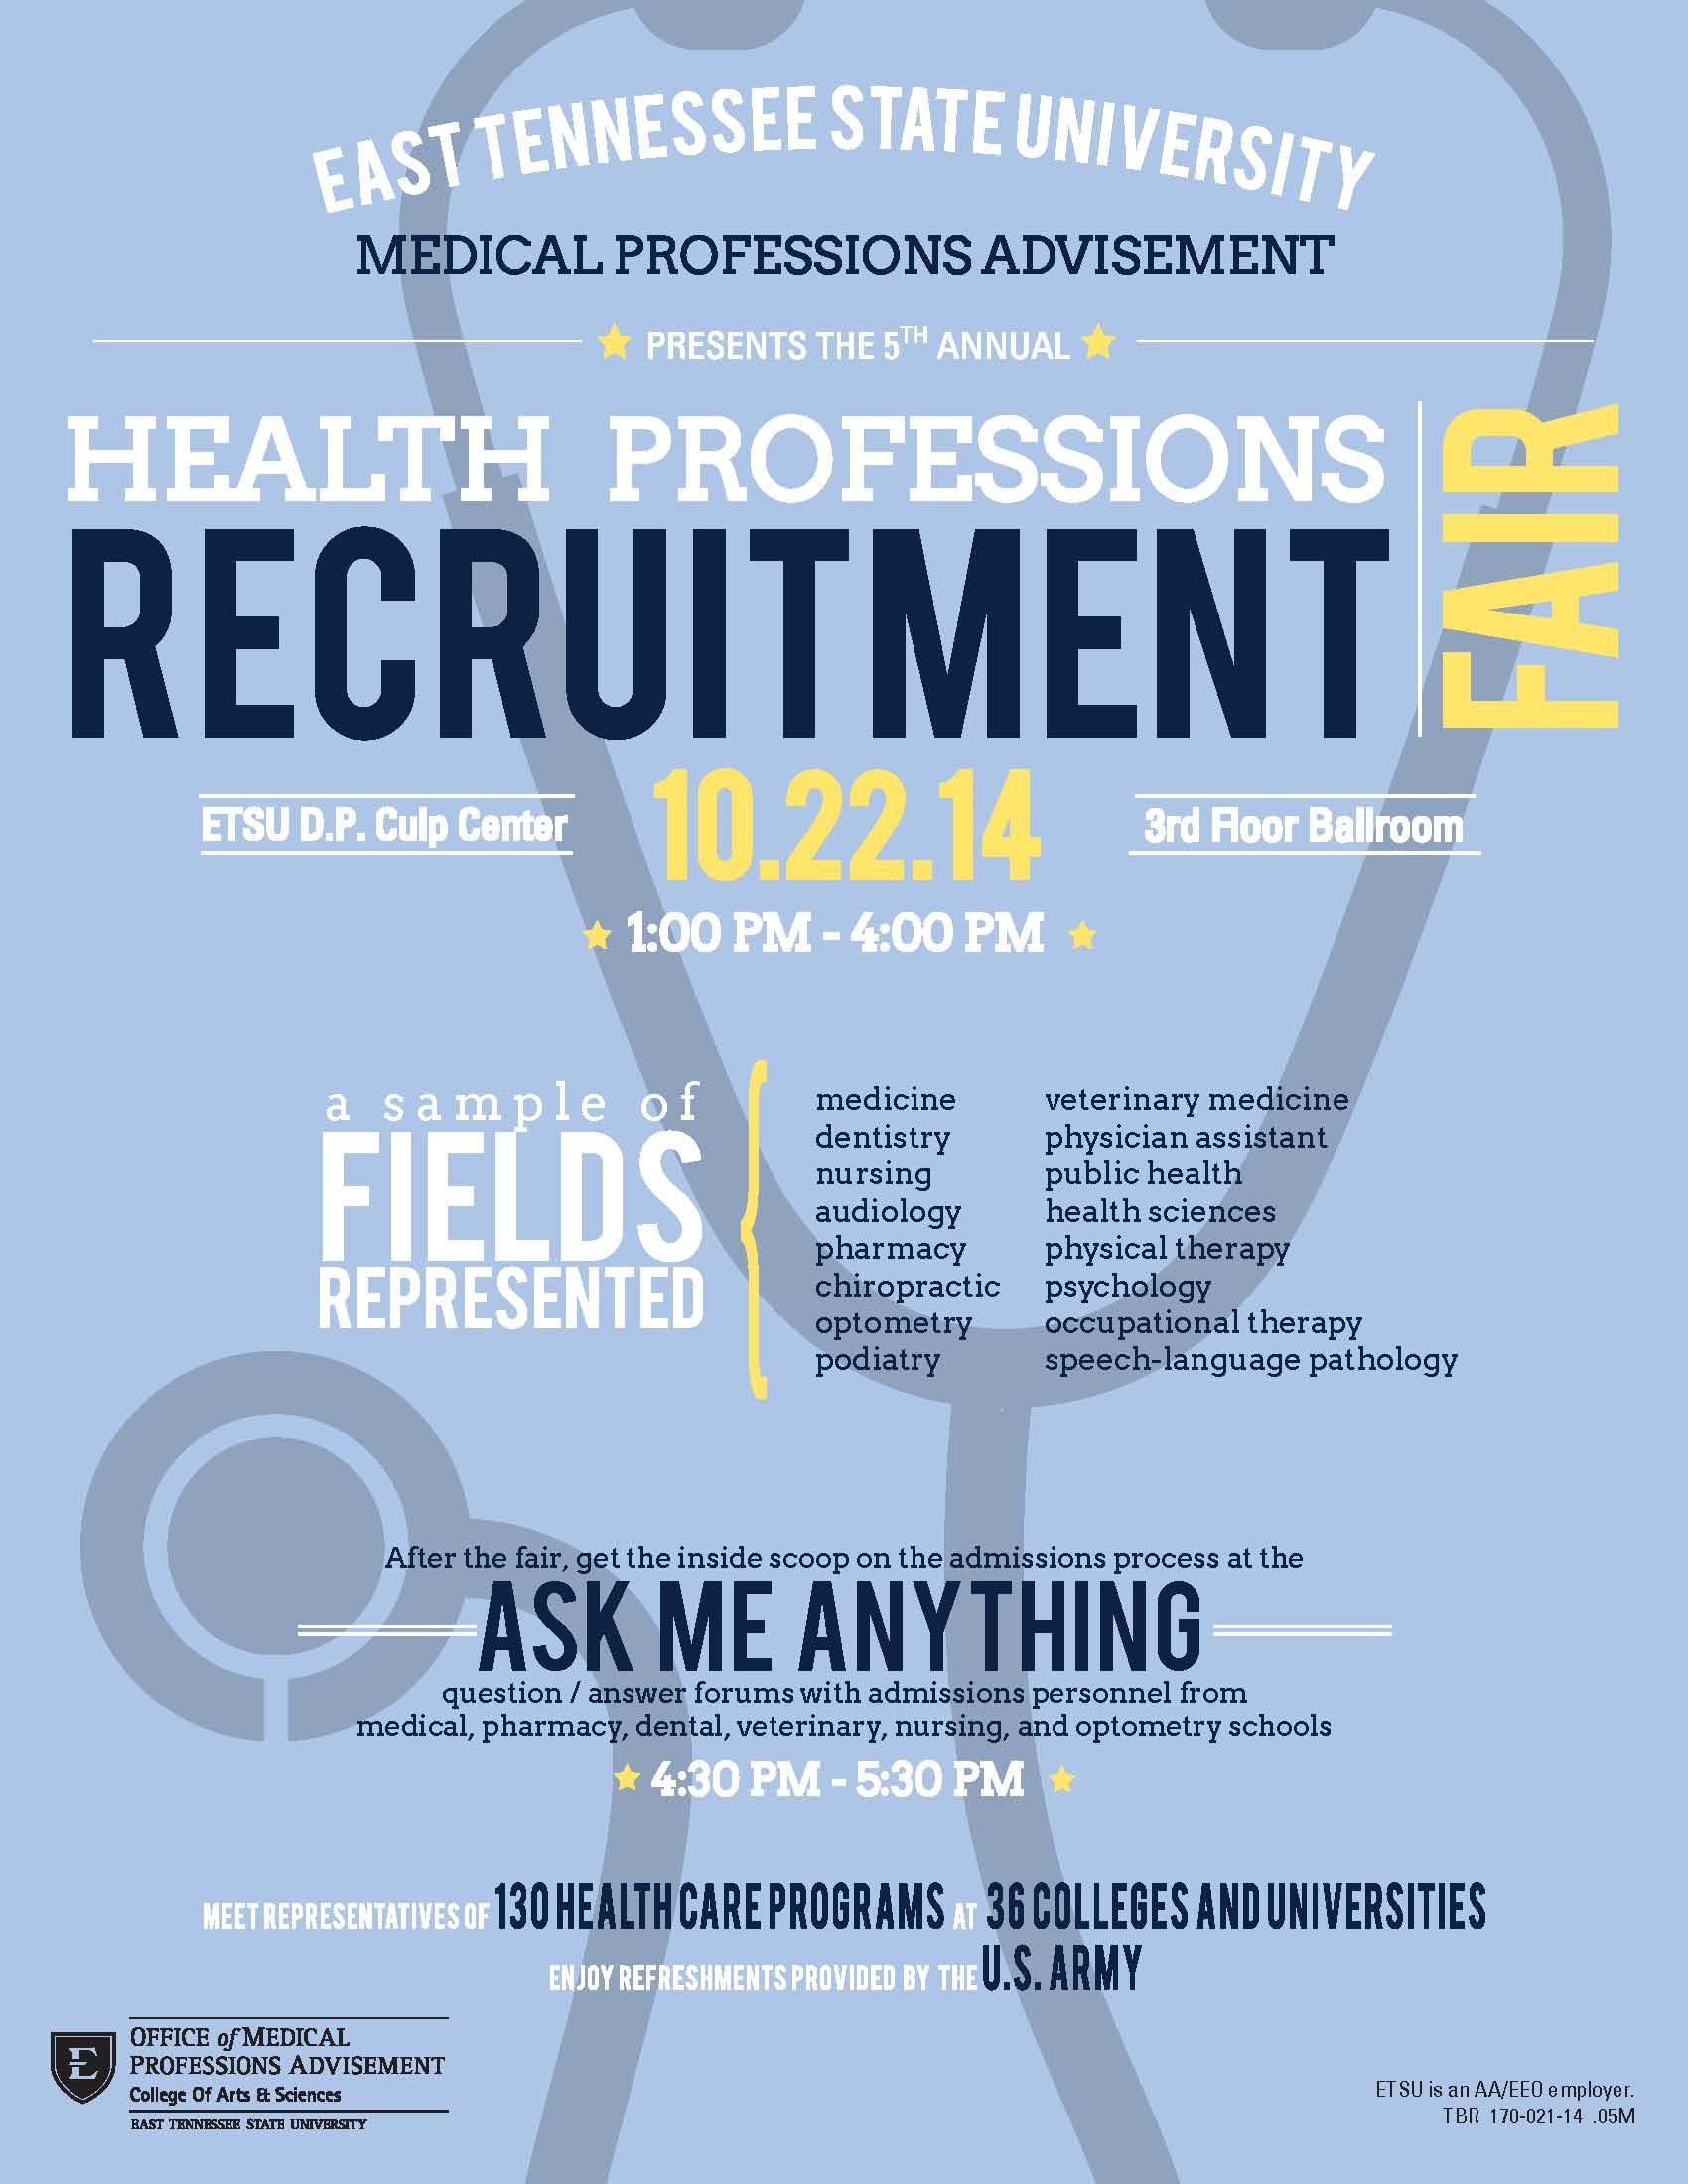 ETSU Health Professions Recruitment Fair